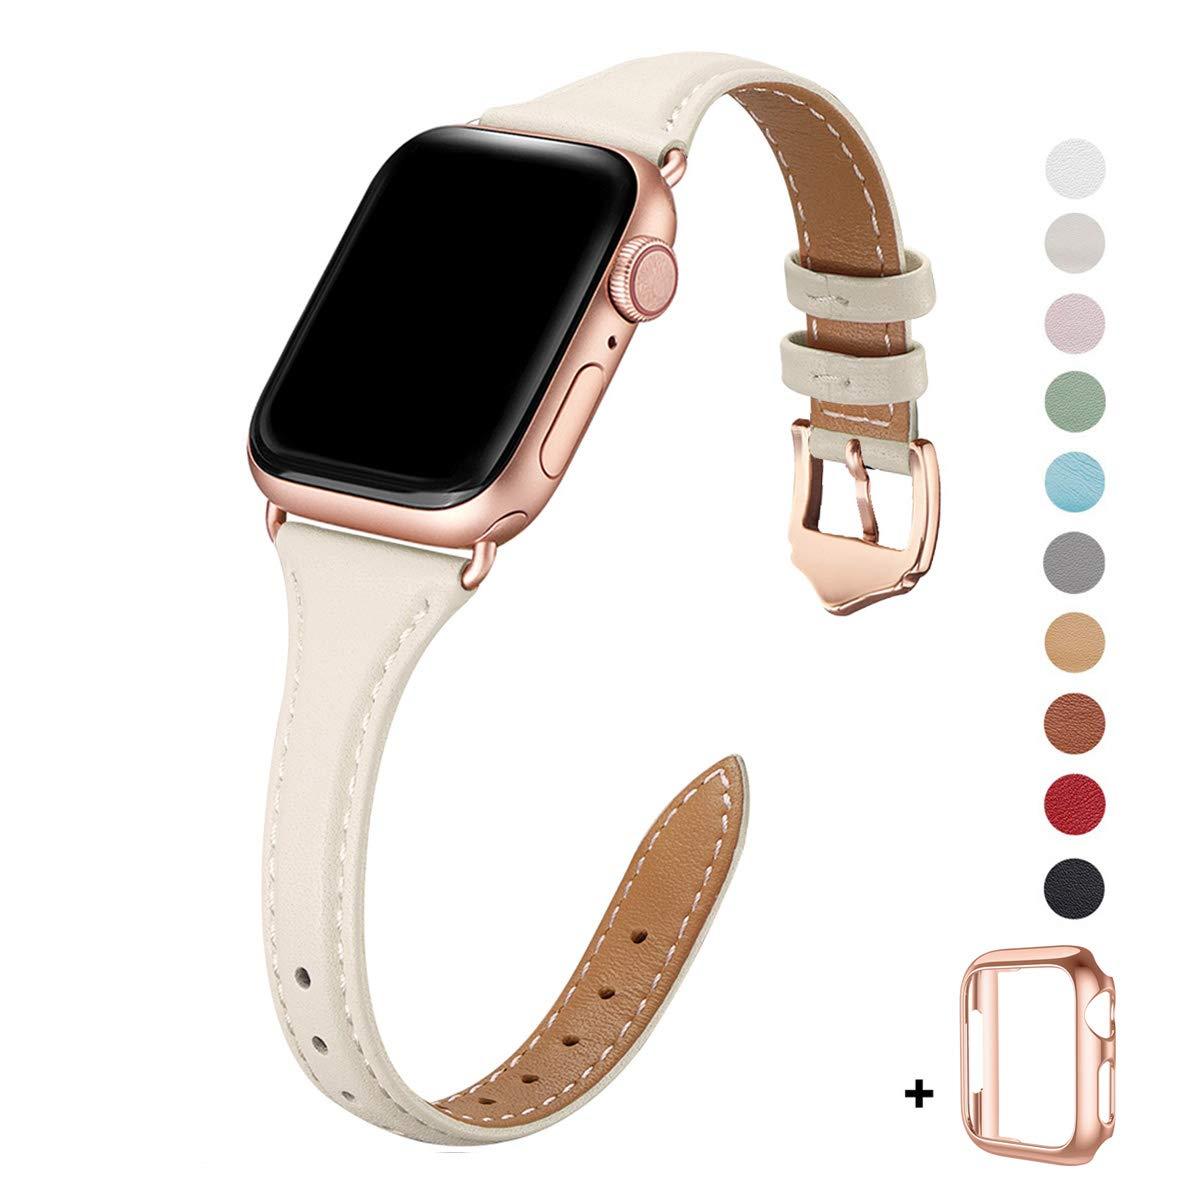 Malla Cuero para Apple Watch (38/40mm) WFEAGL [7T7H6NQH]